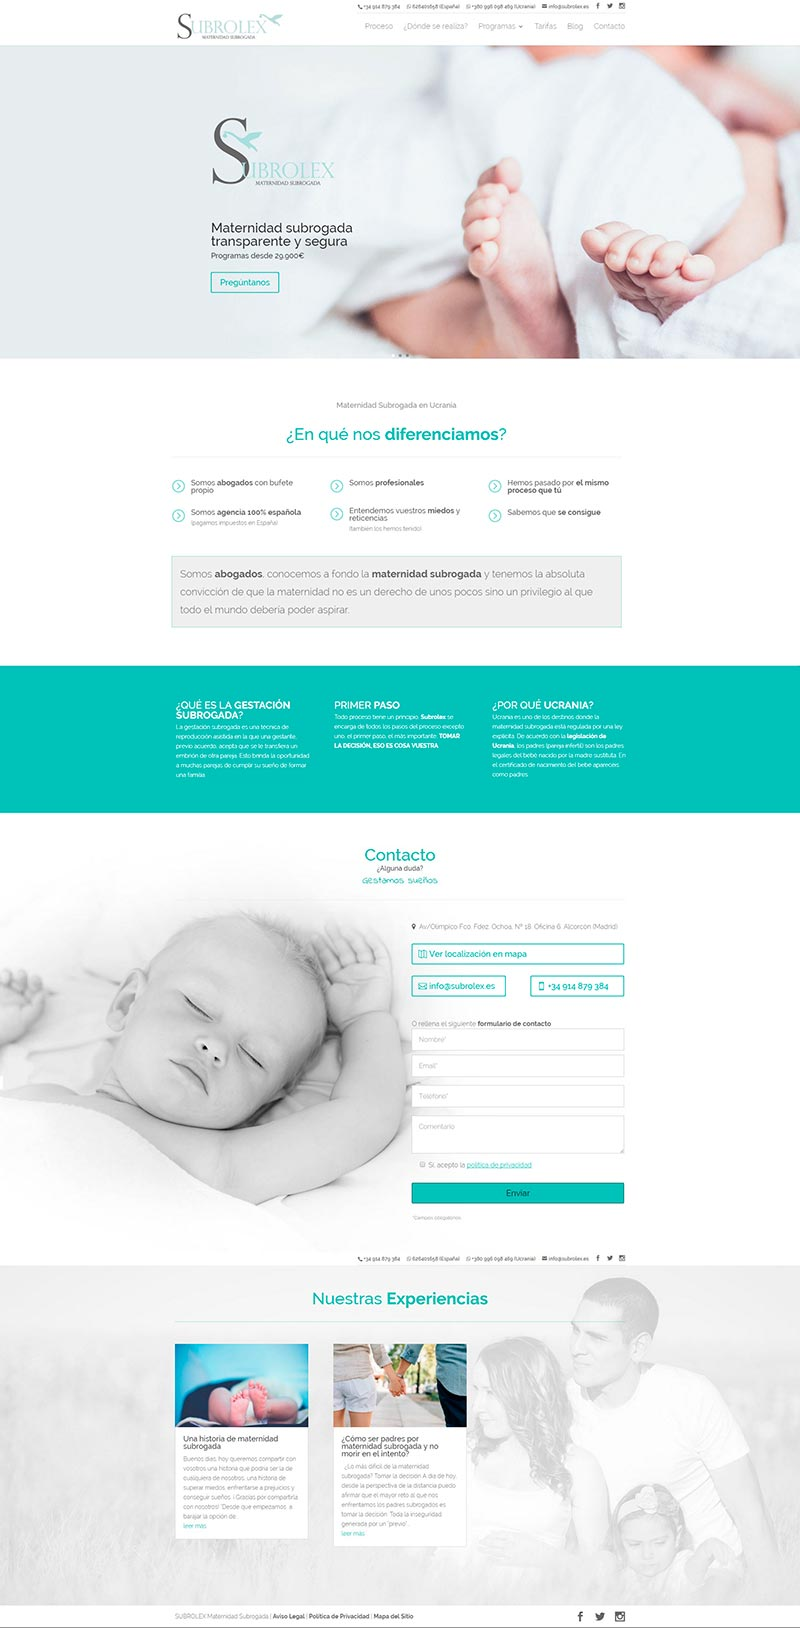 Diseño Web: Subrolex